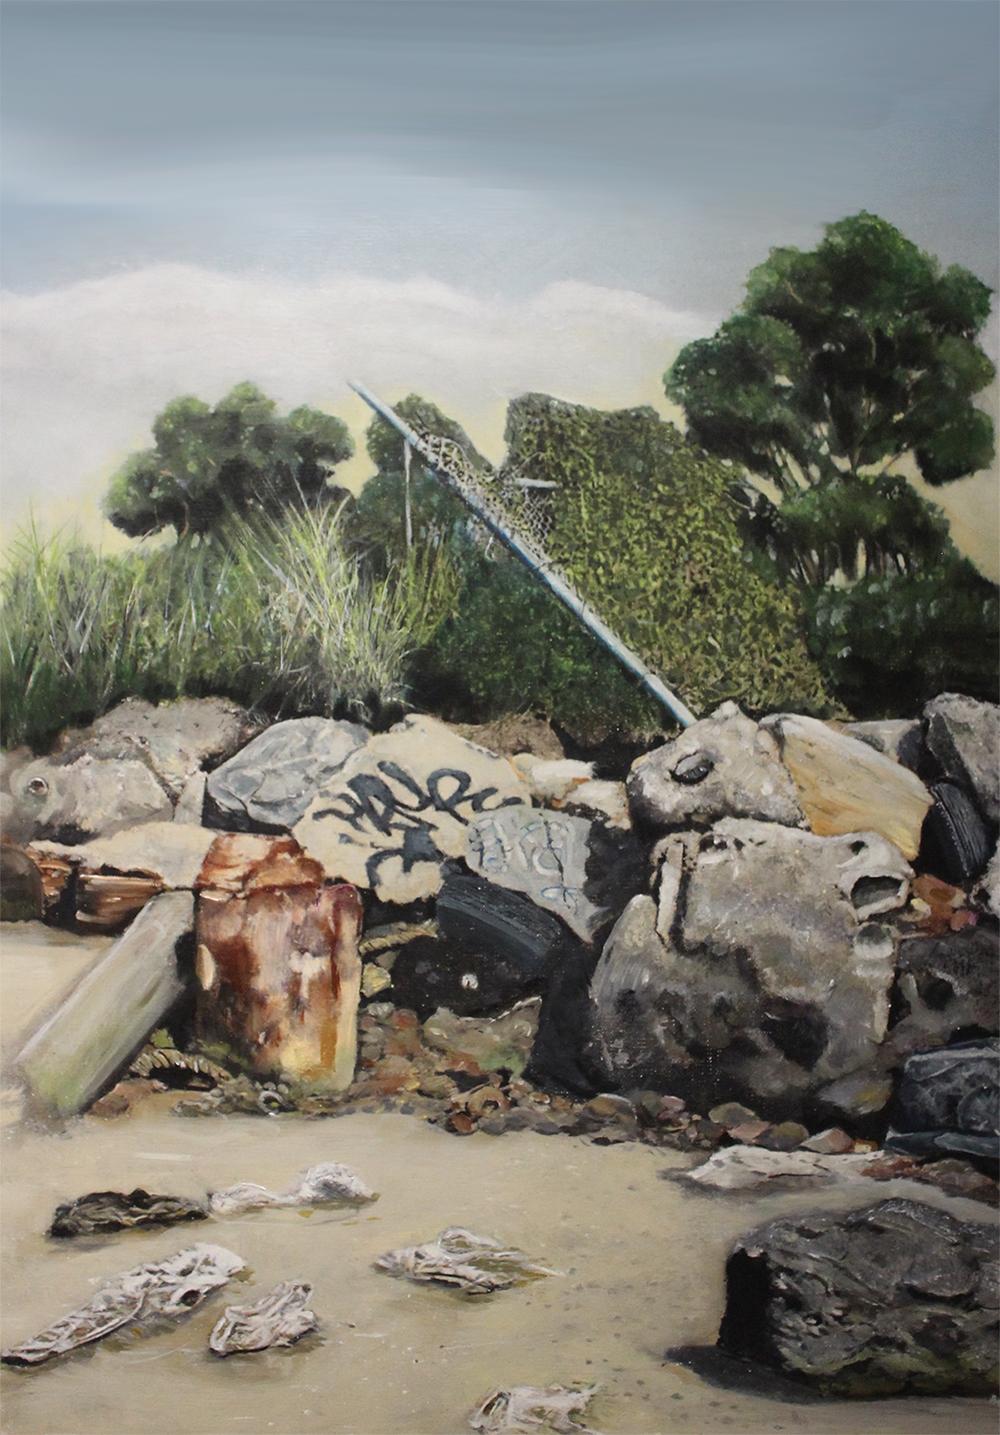 The Beach of Detritus   2016, oil on linen on hardboard  59 x 84 cm